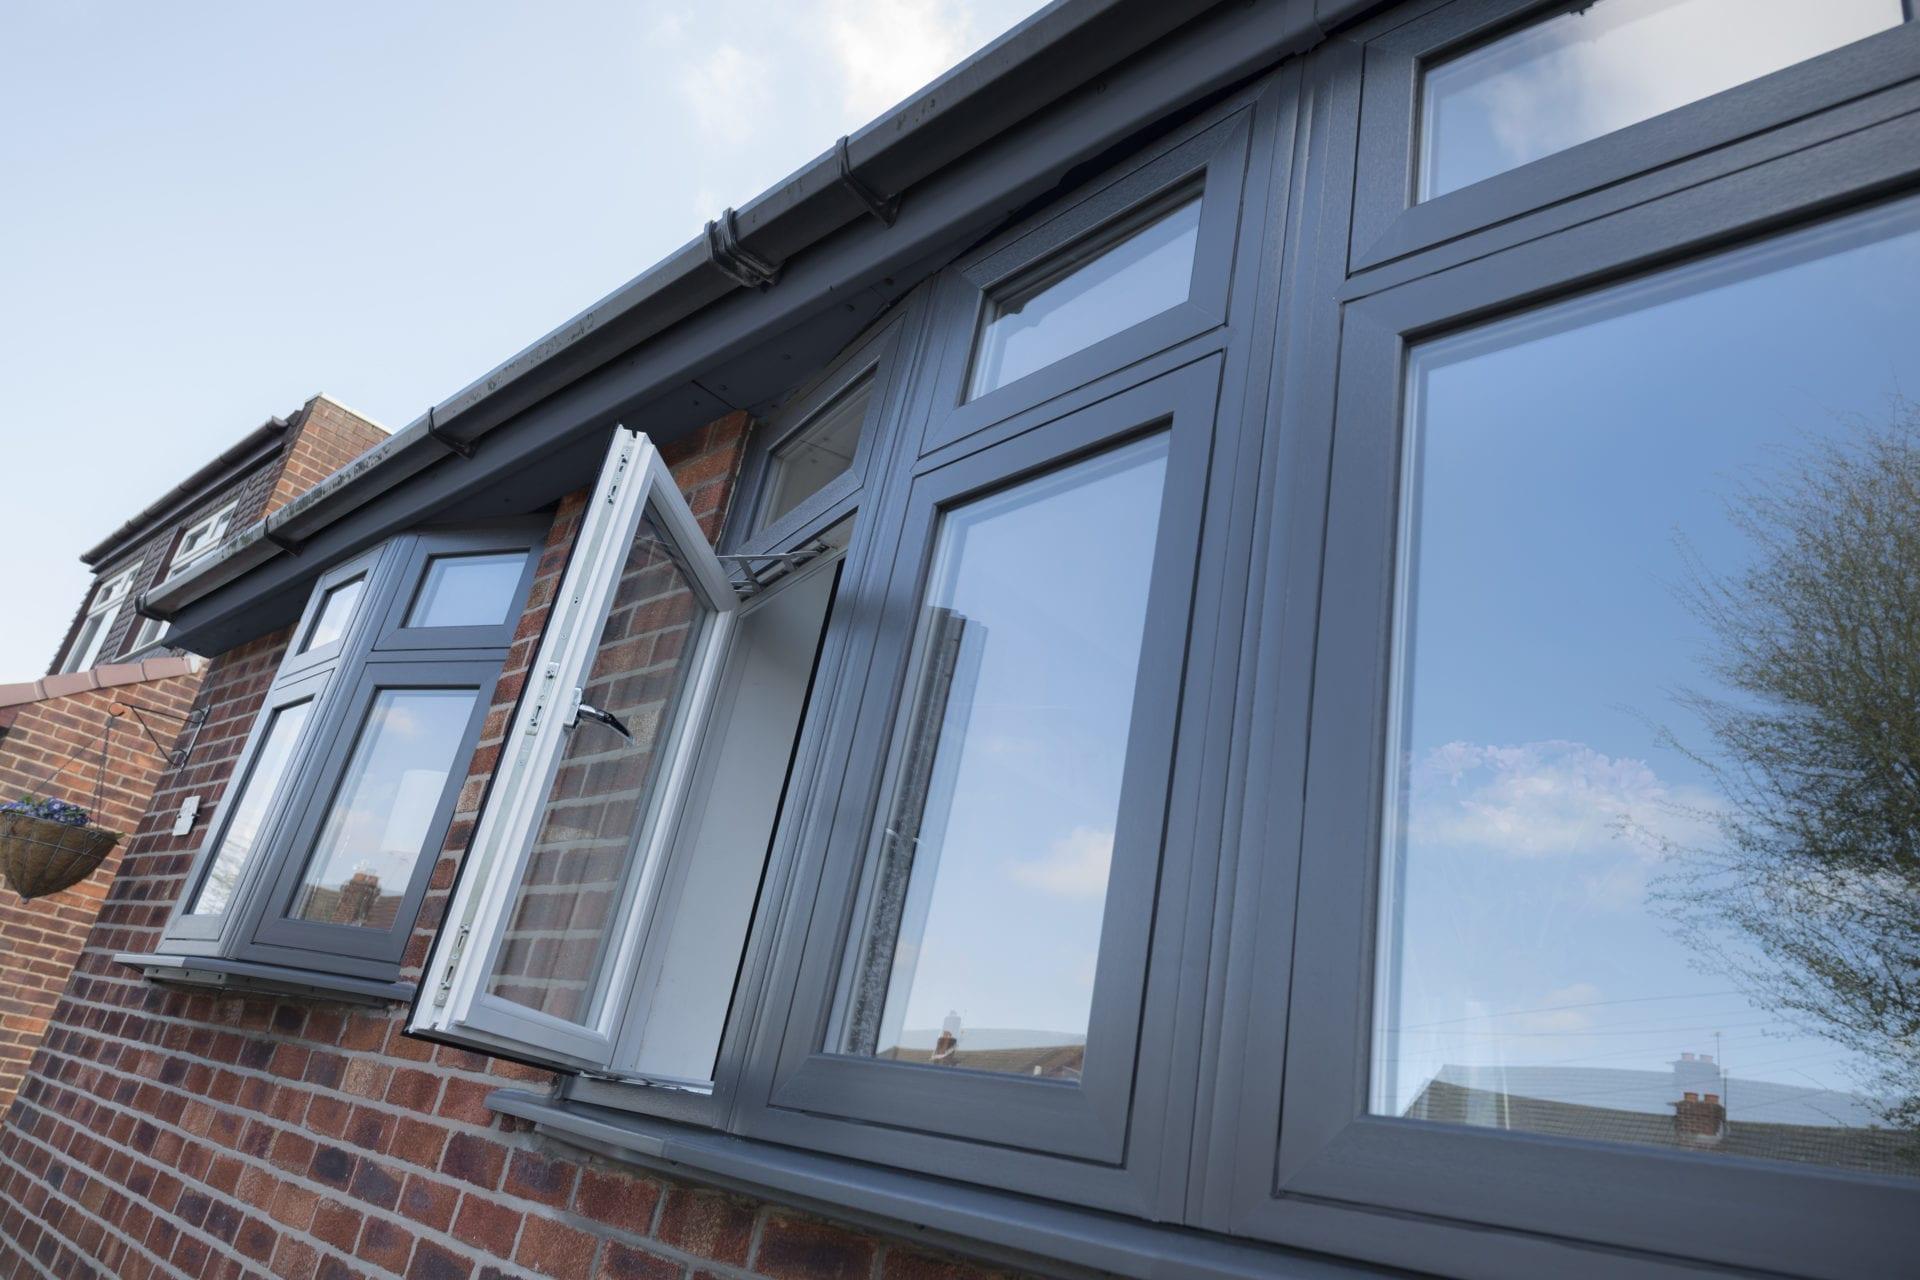 PVCu Flush Casement Windows in Smooth Grey